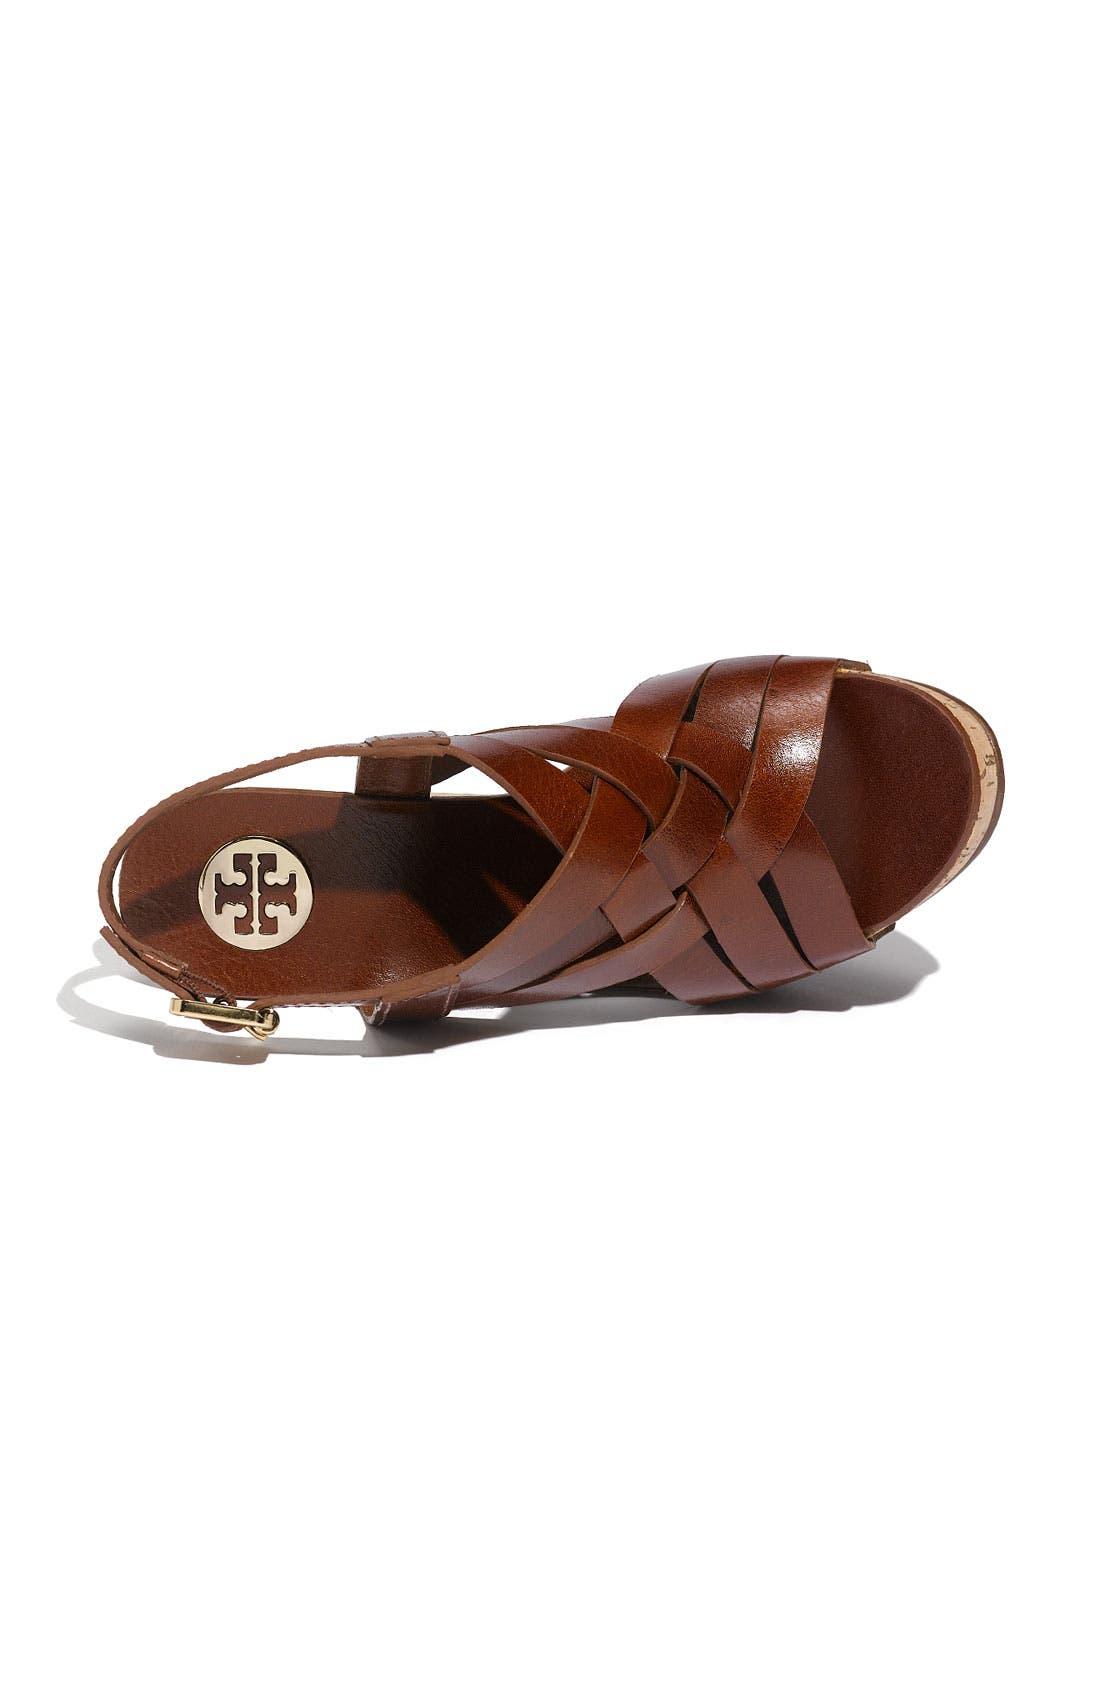 Alternate Image 3  - Tory Burch 'Ace' Wedge Sandal